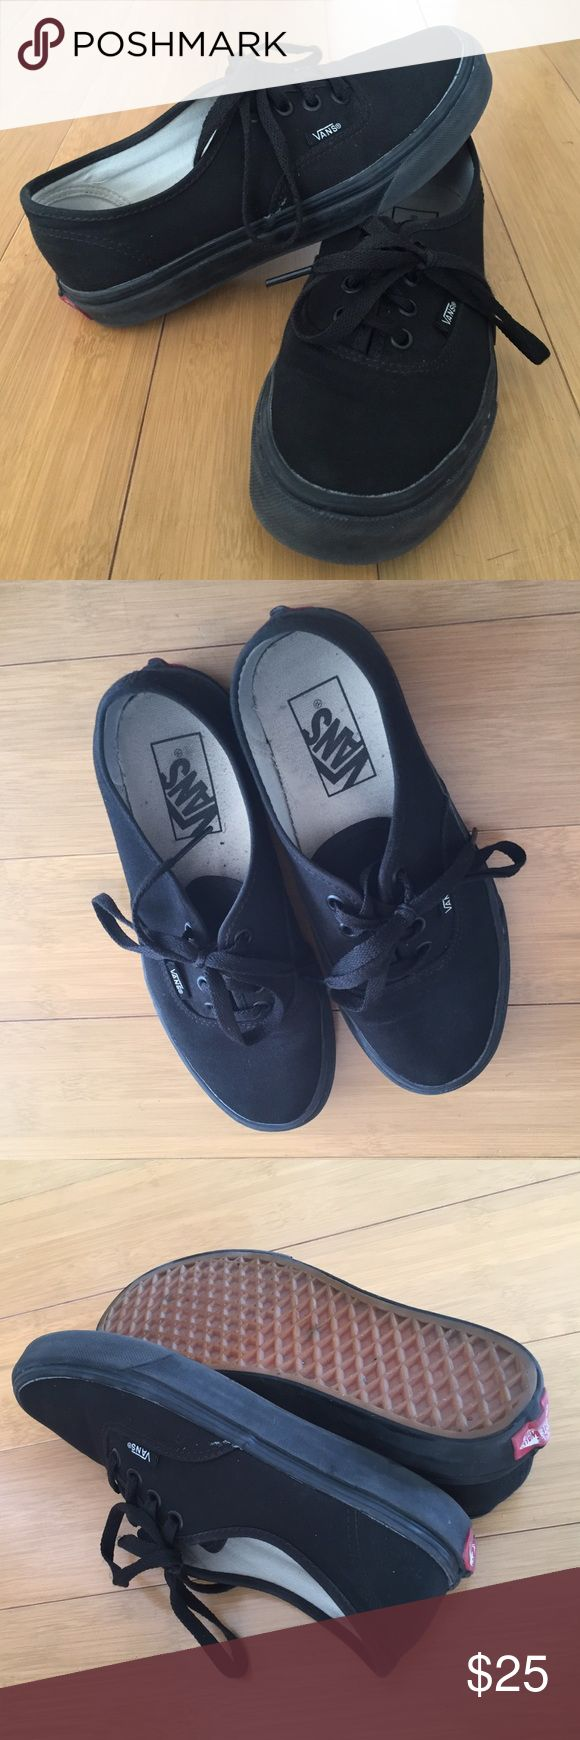 All black VANS authentic sneakers All black VANS authentic style sneakers. Hardly worn. Vans Shoes Sneakers